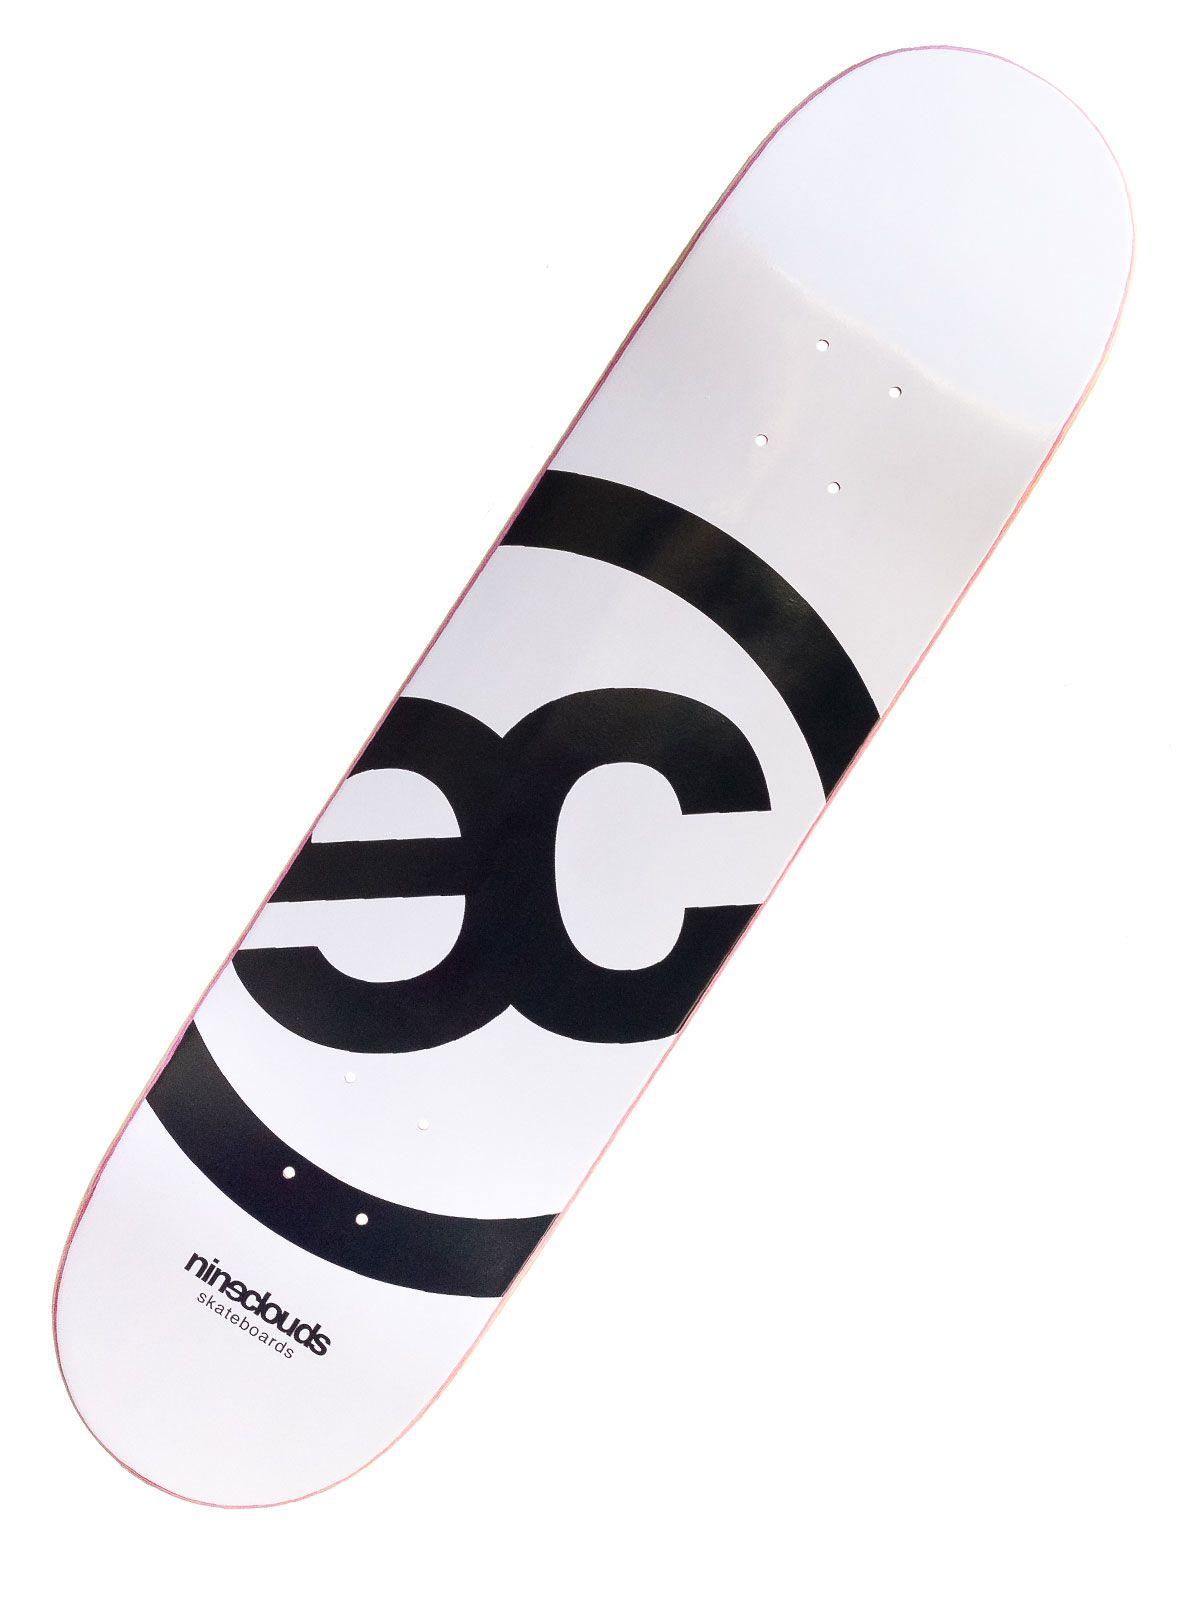 shape-nineclouds-logo-moeda-branco-8125-1-image